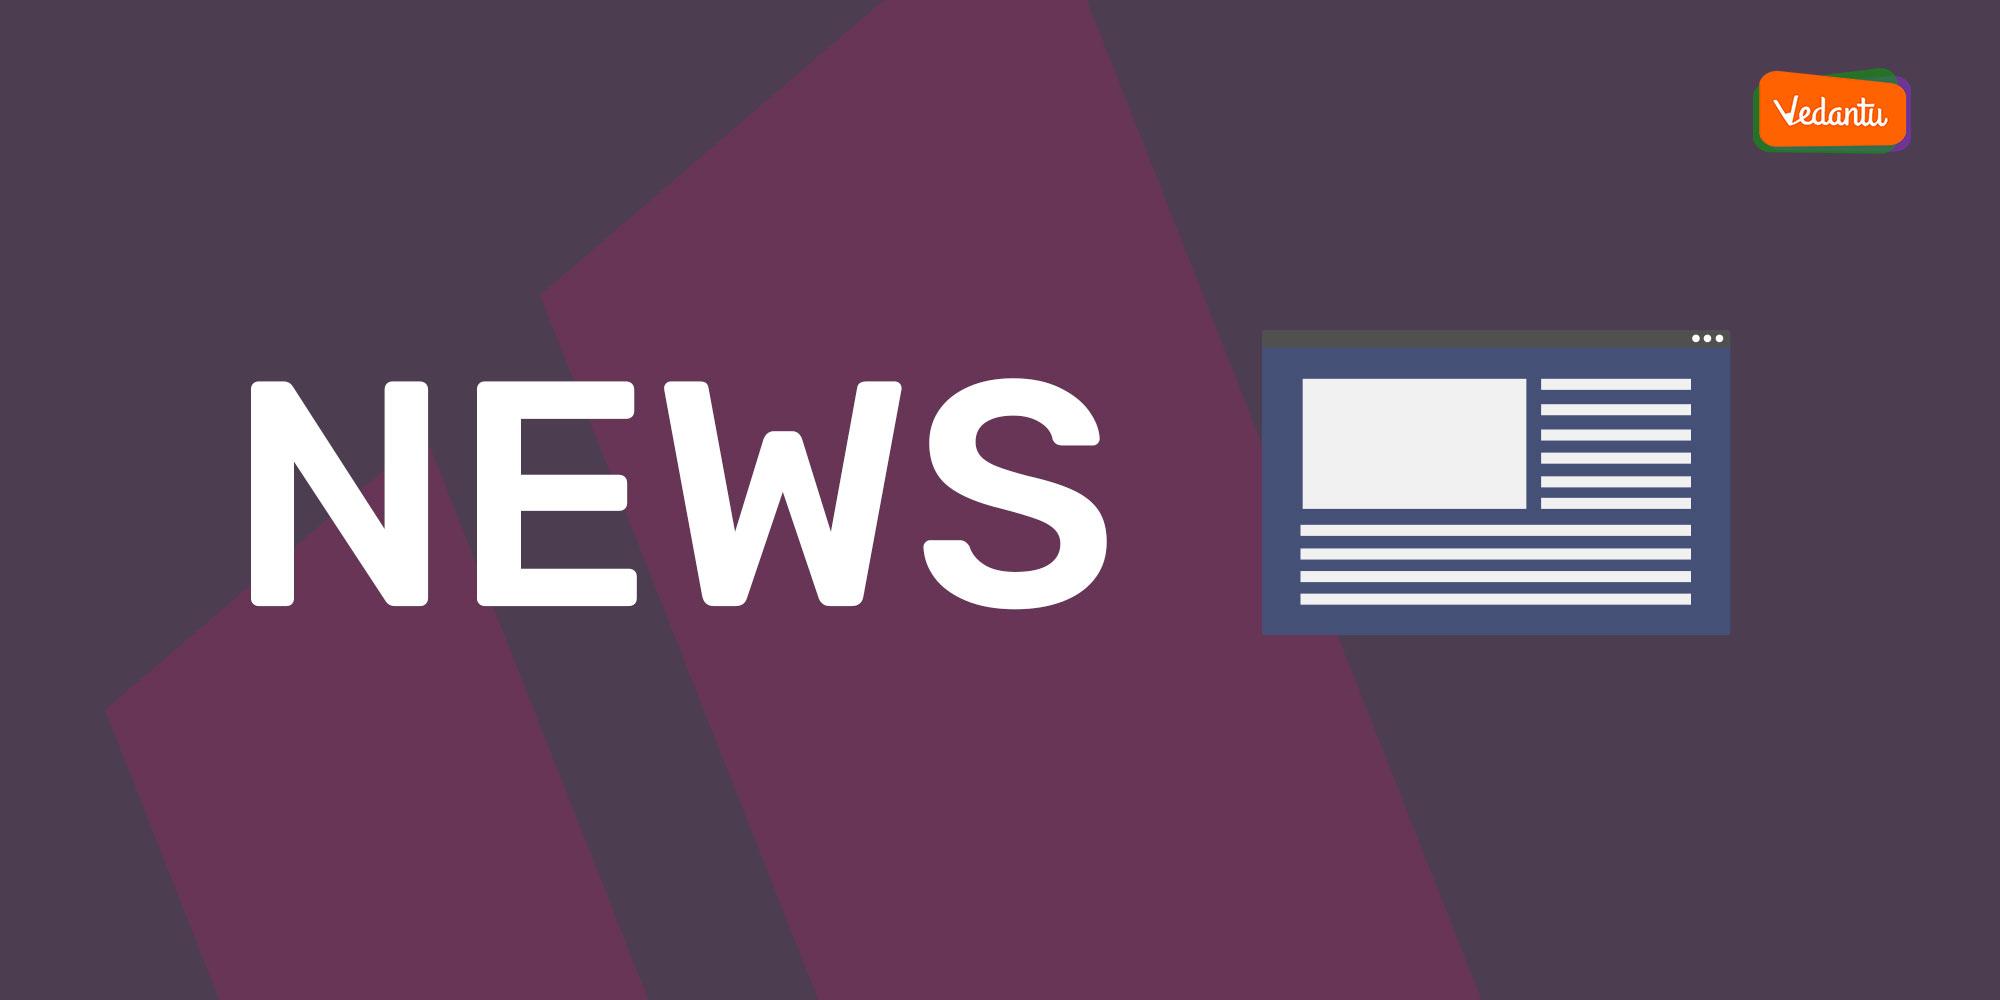 NEET-UG 2020 - Application Correction Window Reopens Till September 30